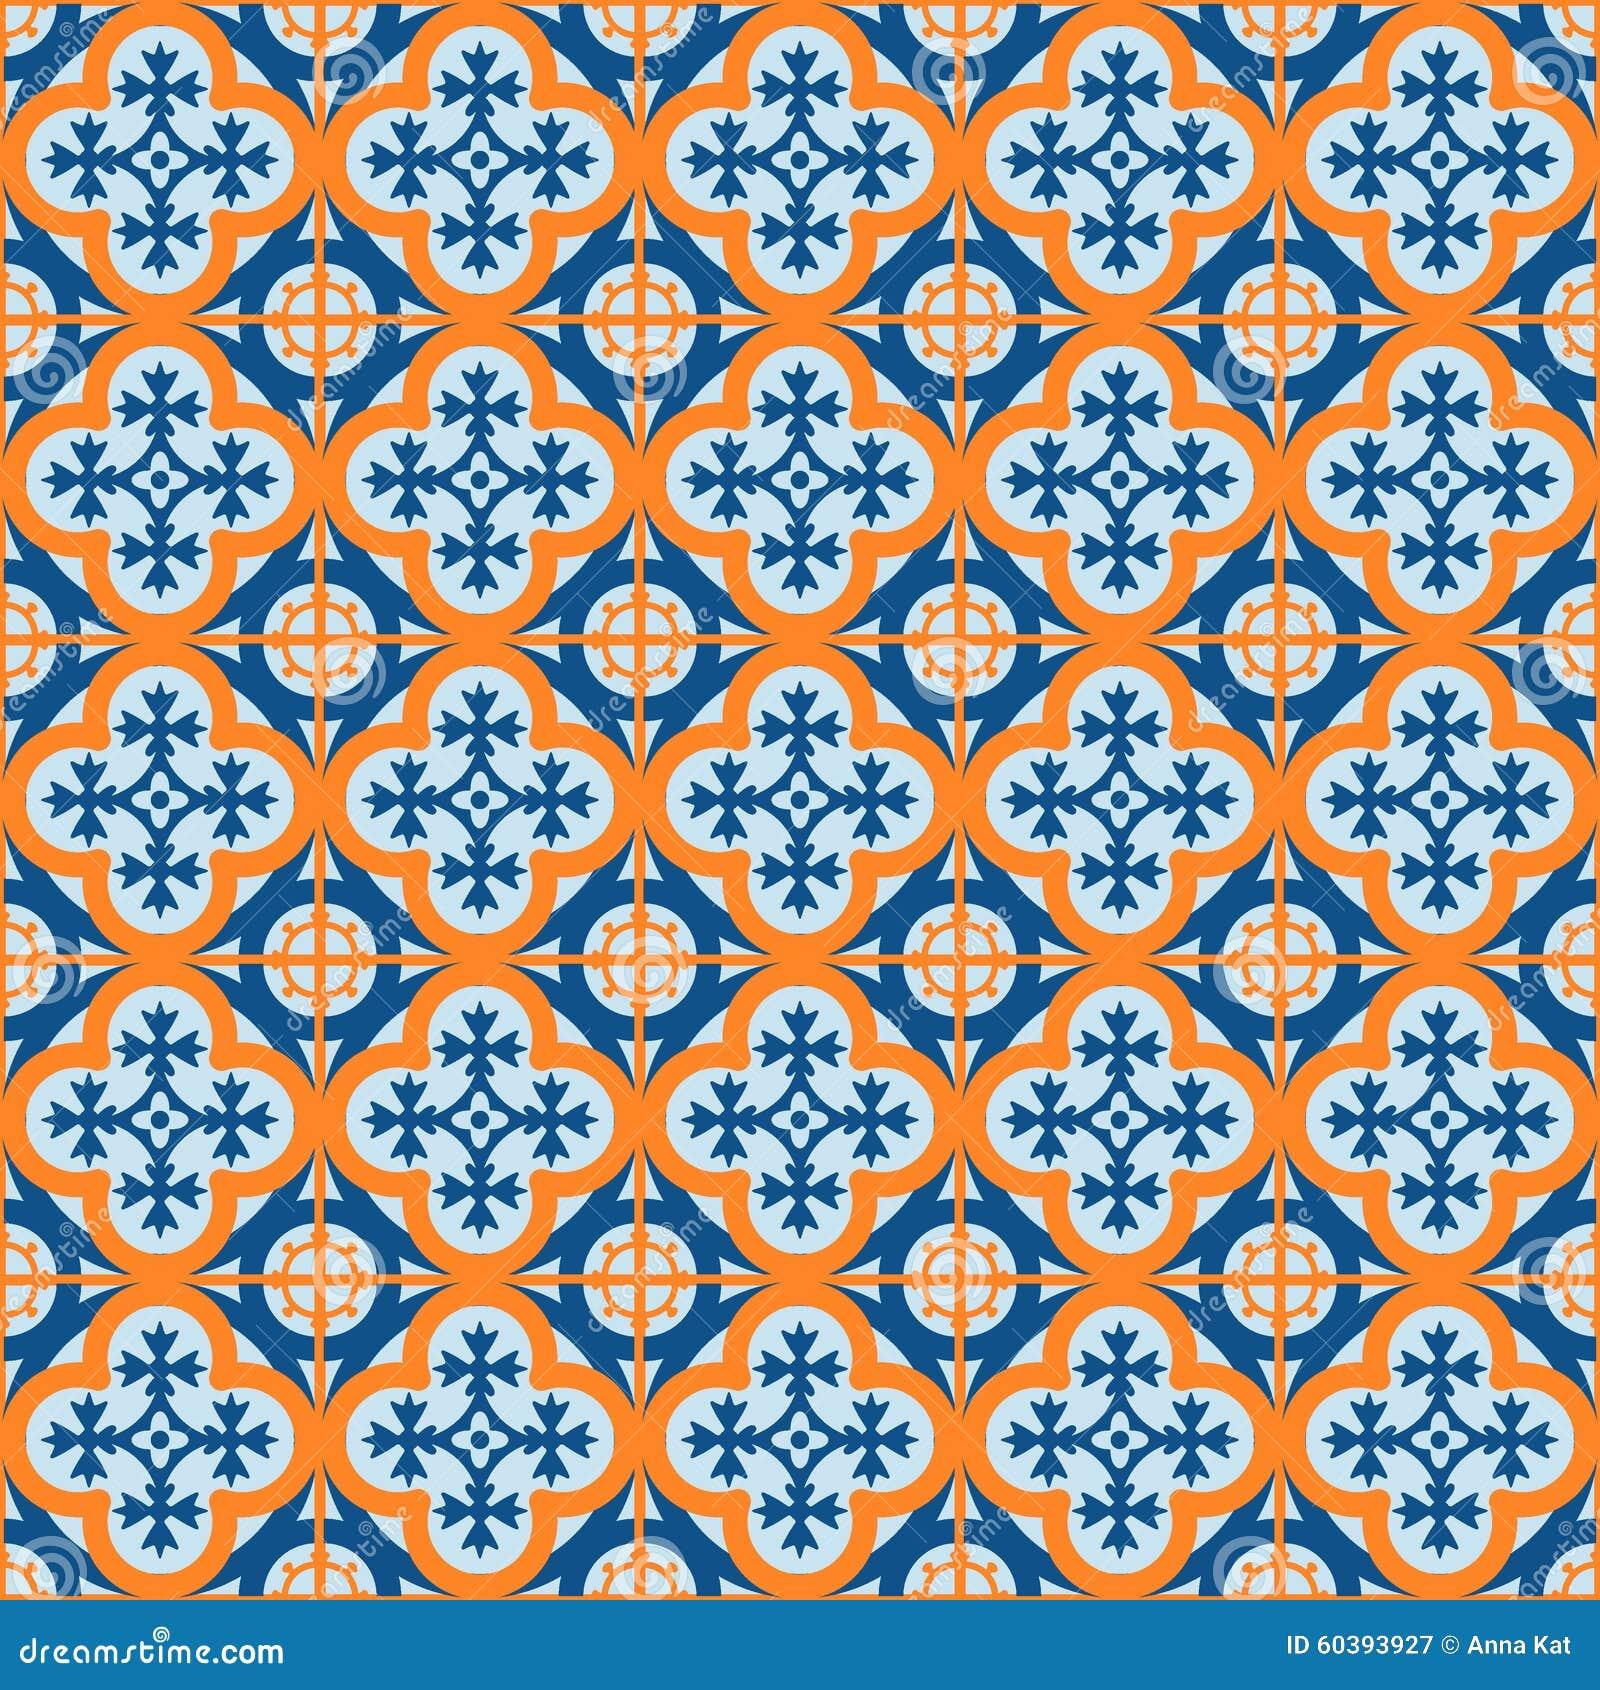 Marokkanische fliesen vektor abbildung bild 60393927 for Marokkanische fliesen